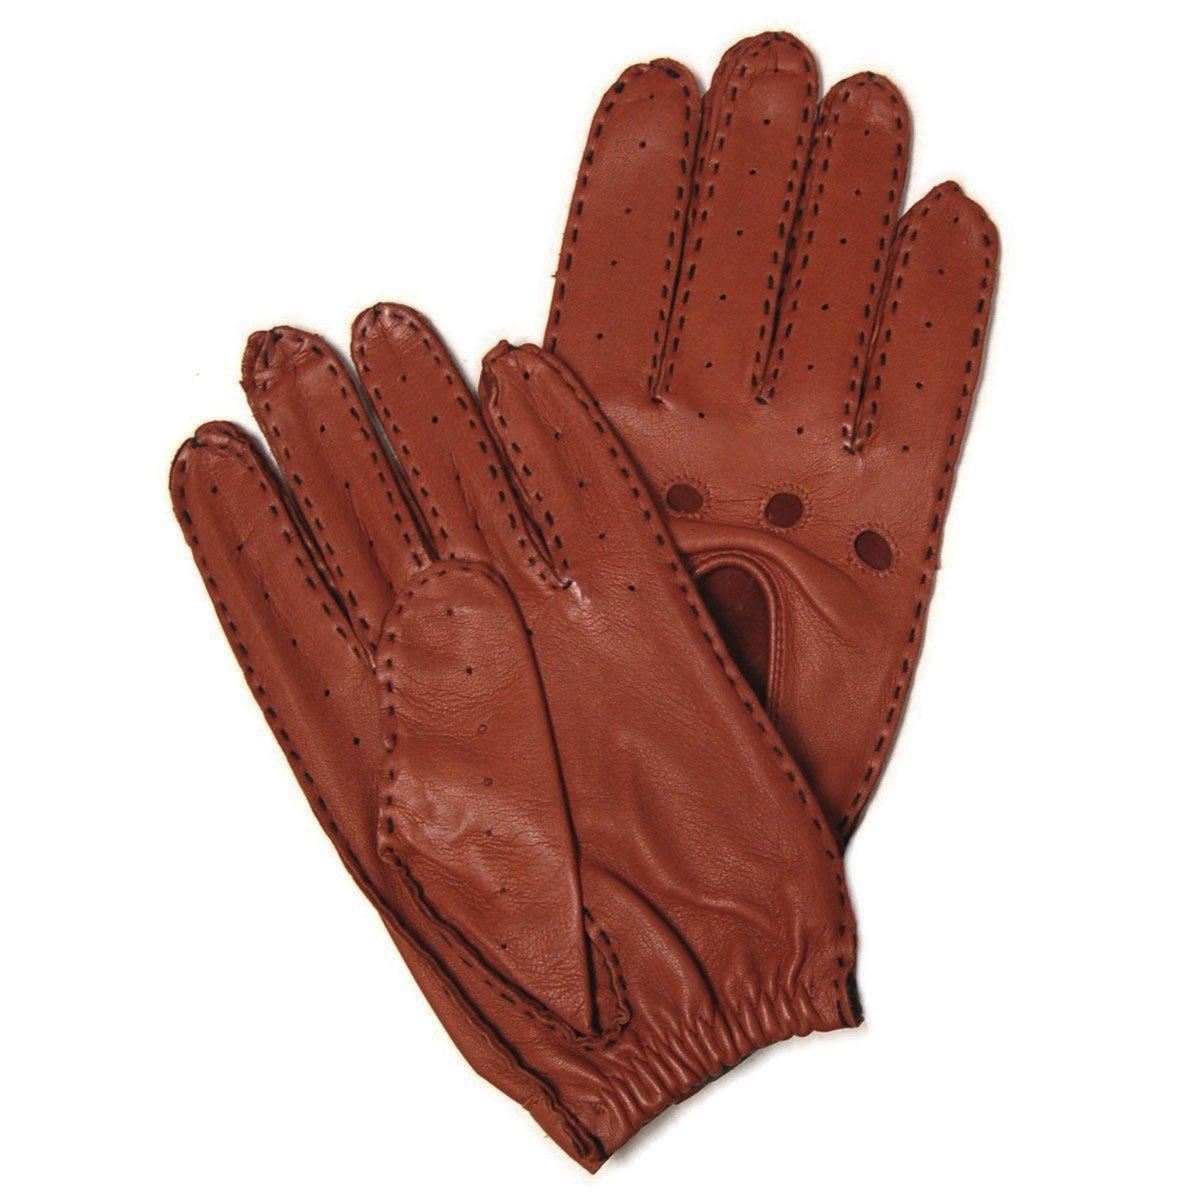 Hilts-Willard Men's Leather Driving Gloves - M - Brown